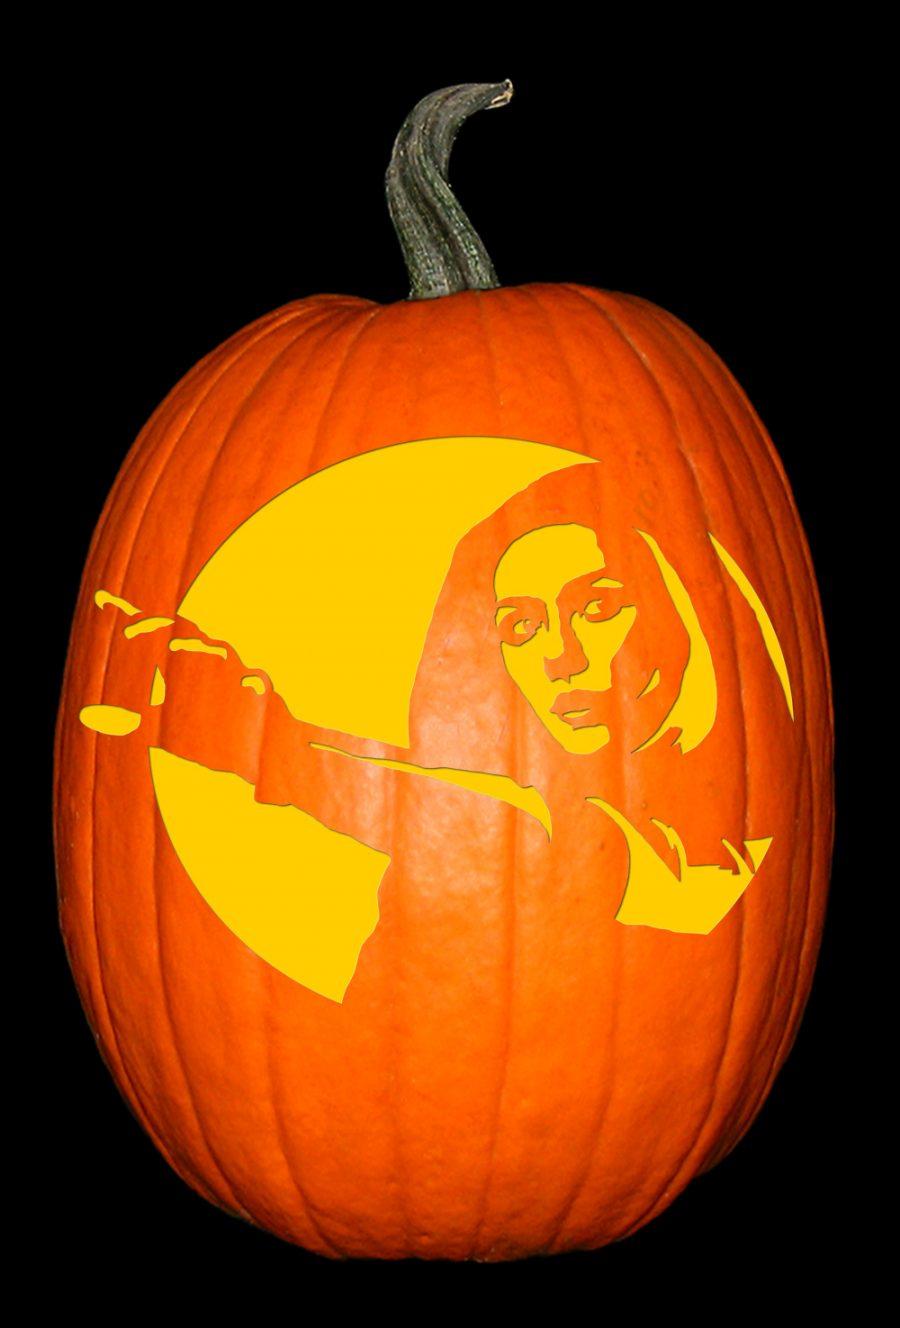 Marvel - Scarlet Witch Pumpkin